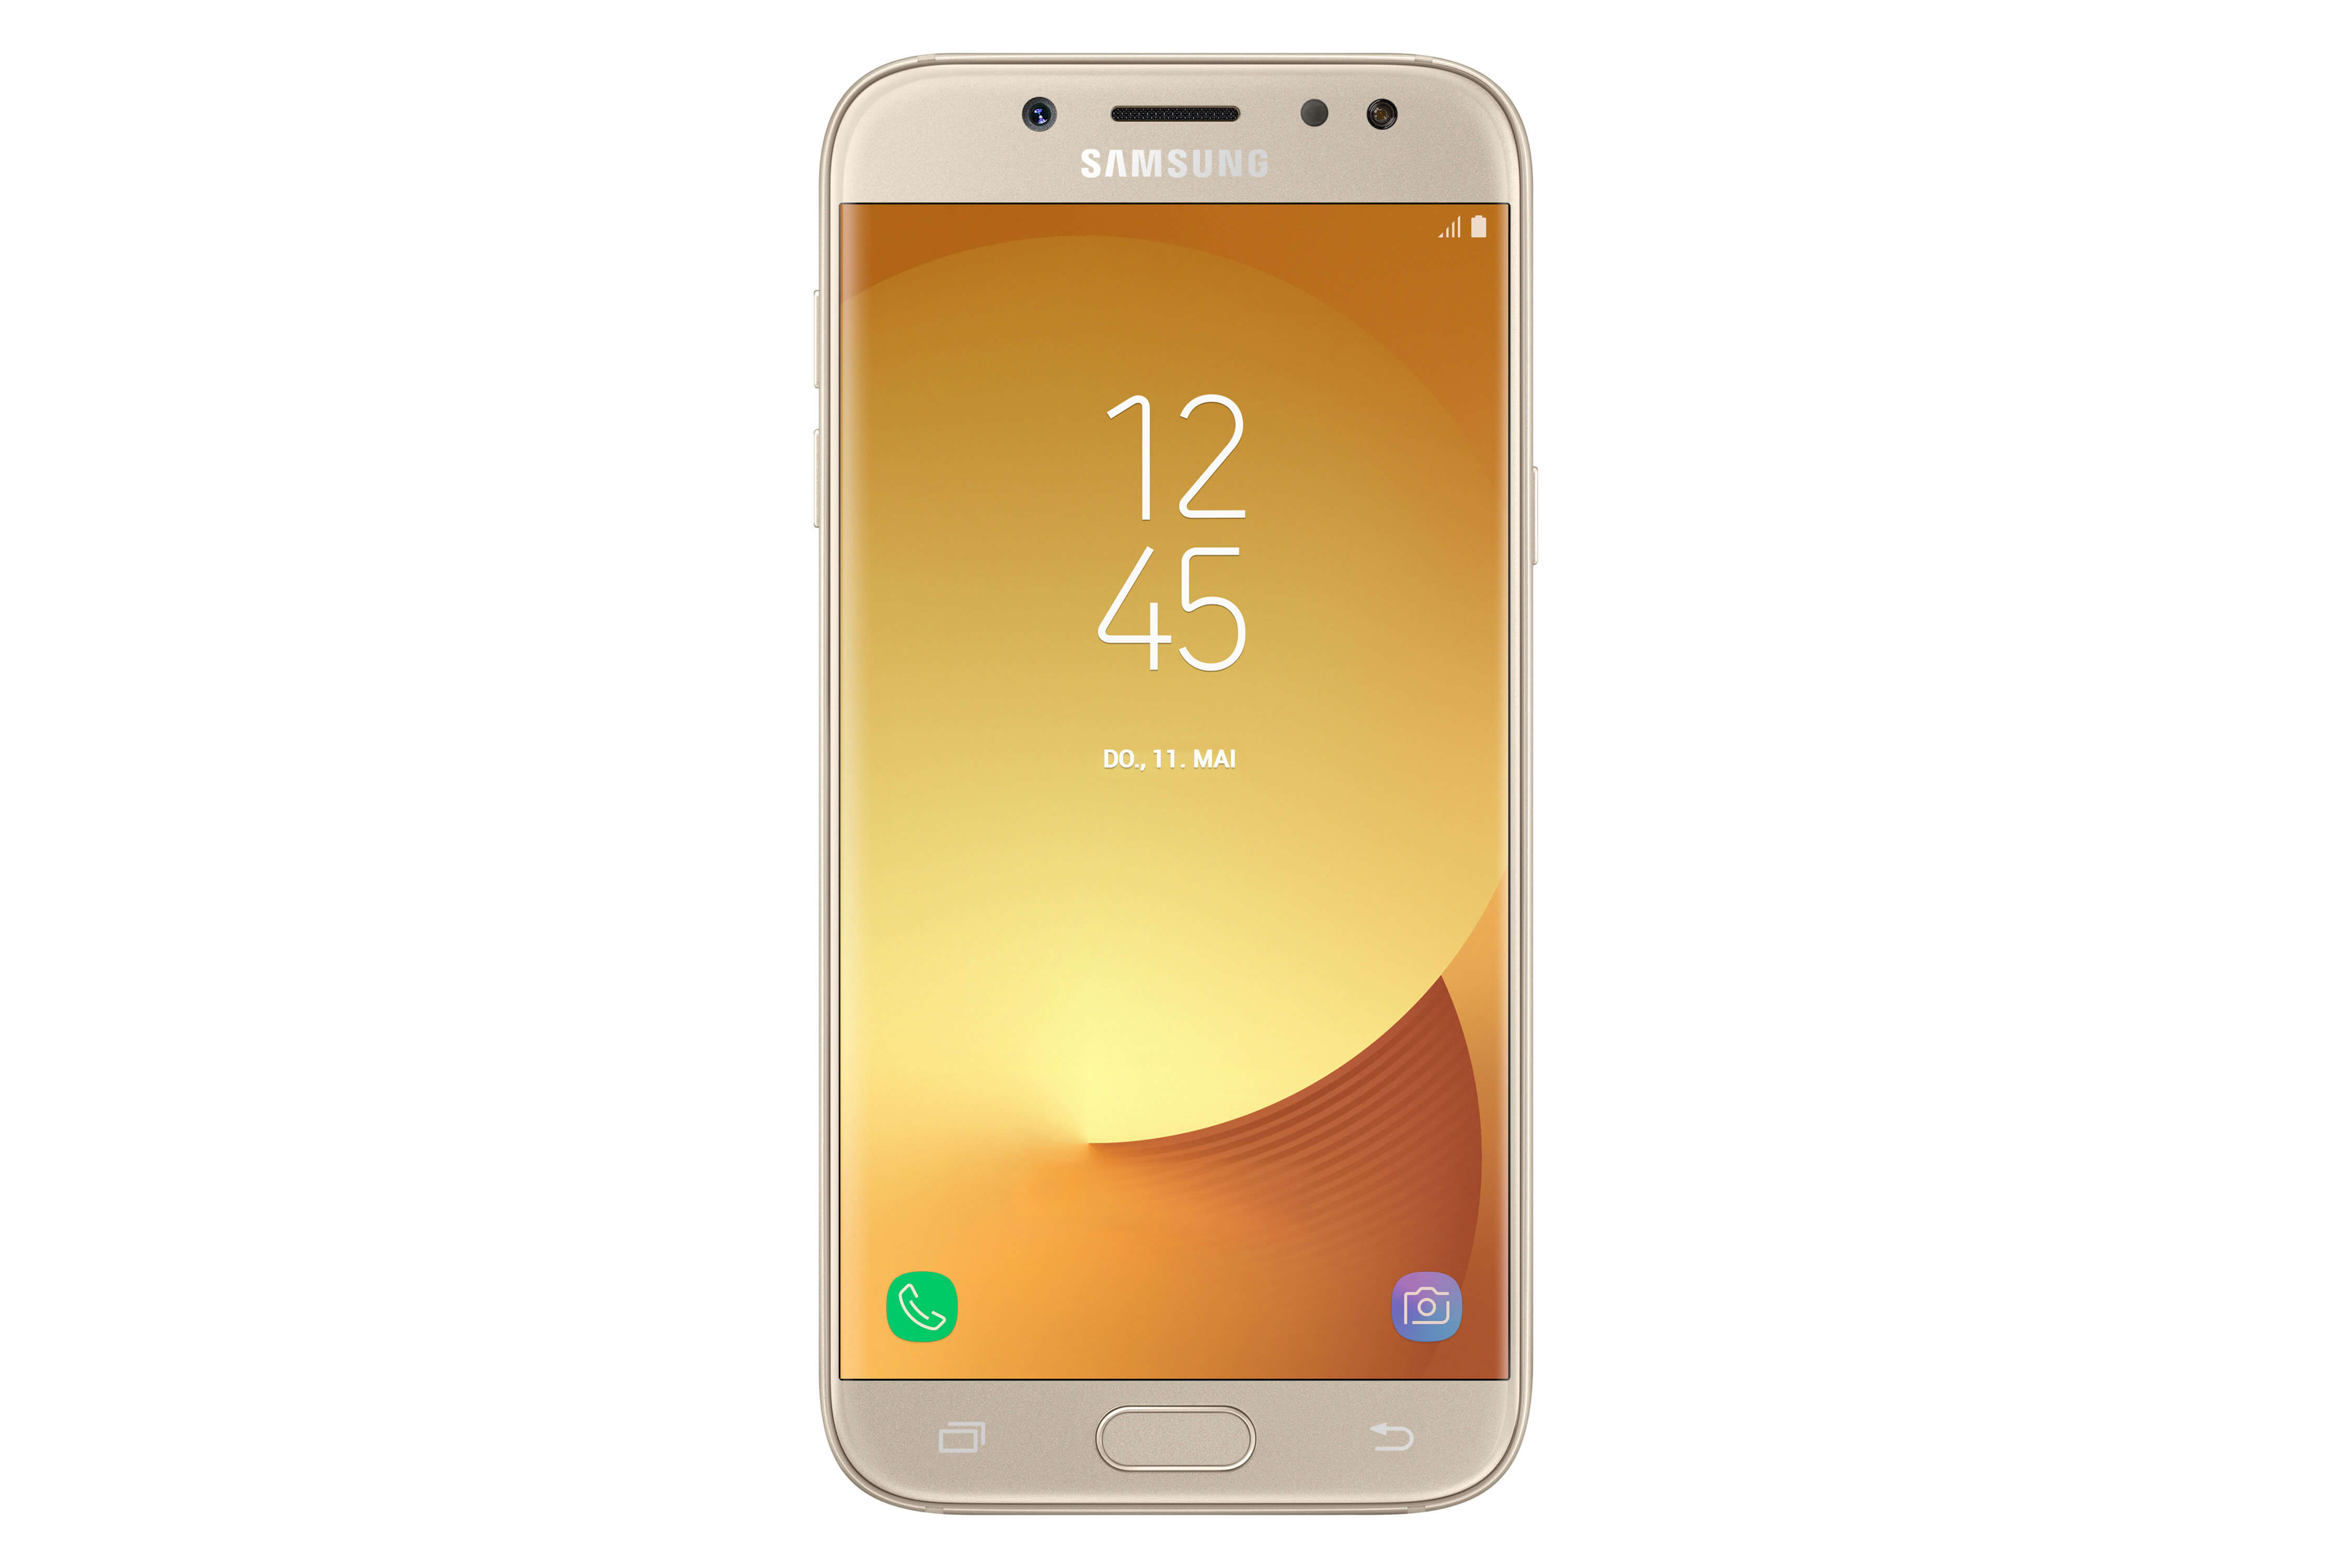 Samsung Galaxy J5 2017 DUOS SM J530FD gold fronti468mFDGb1HSe